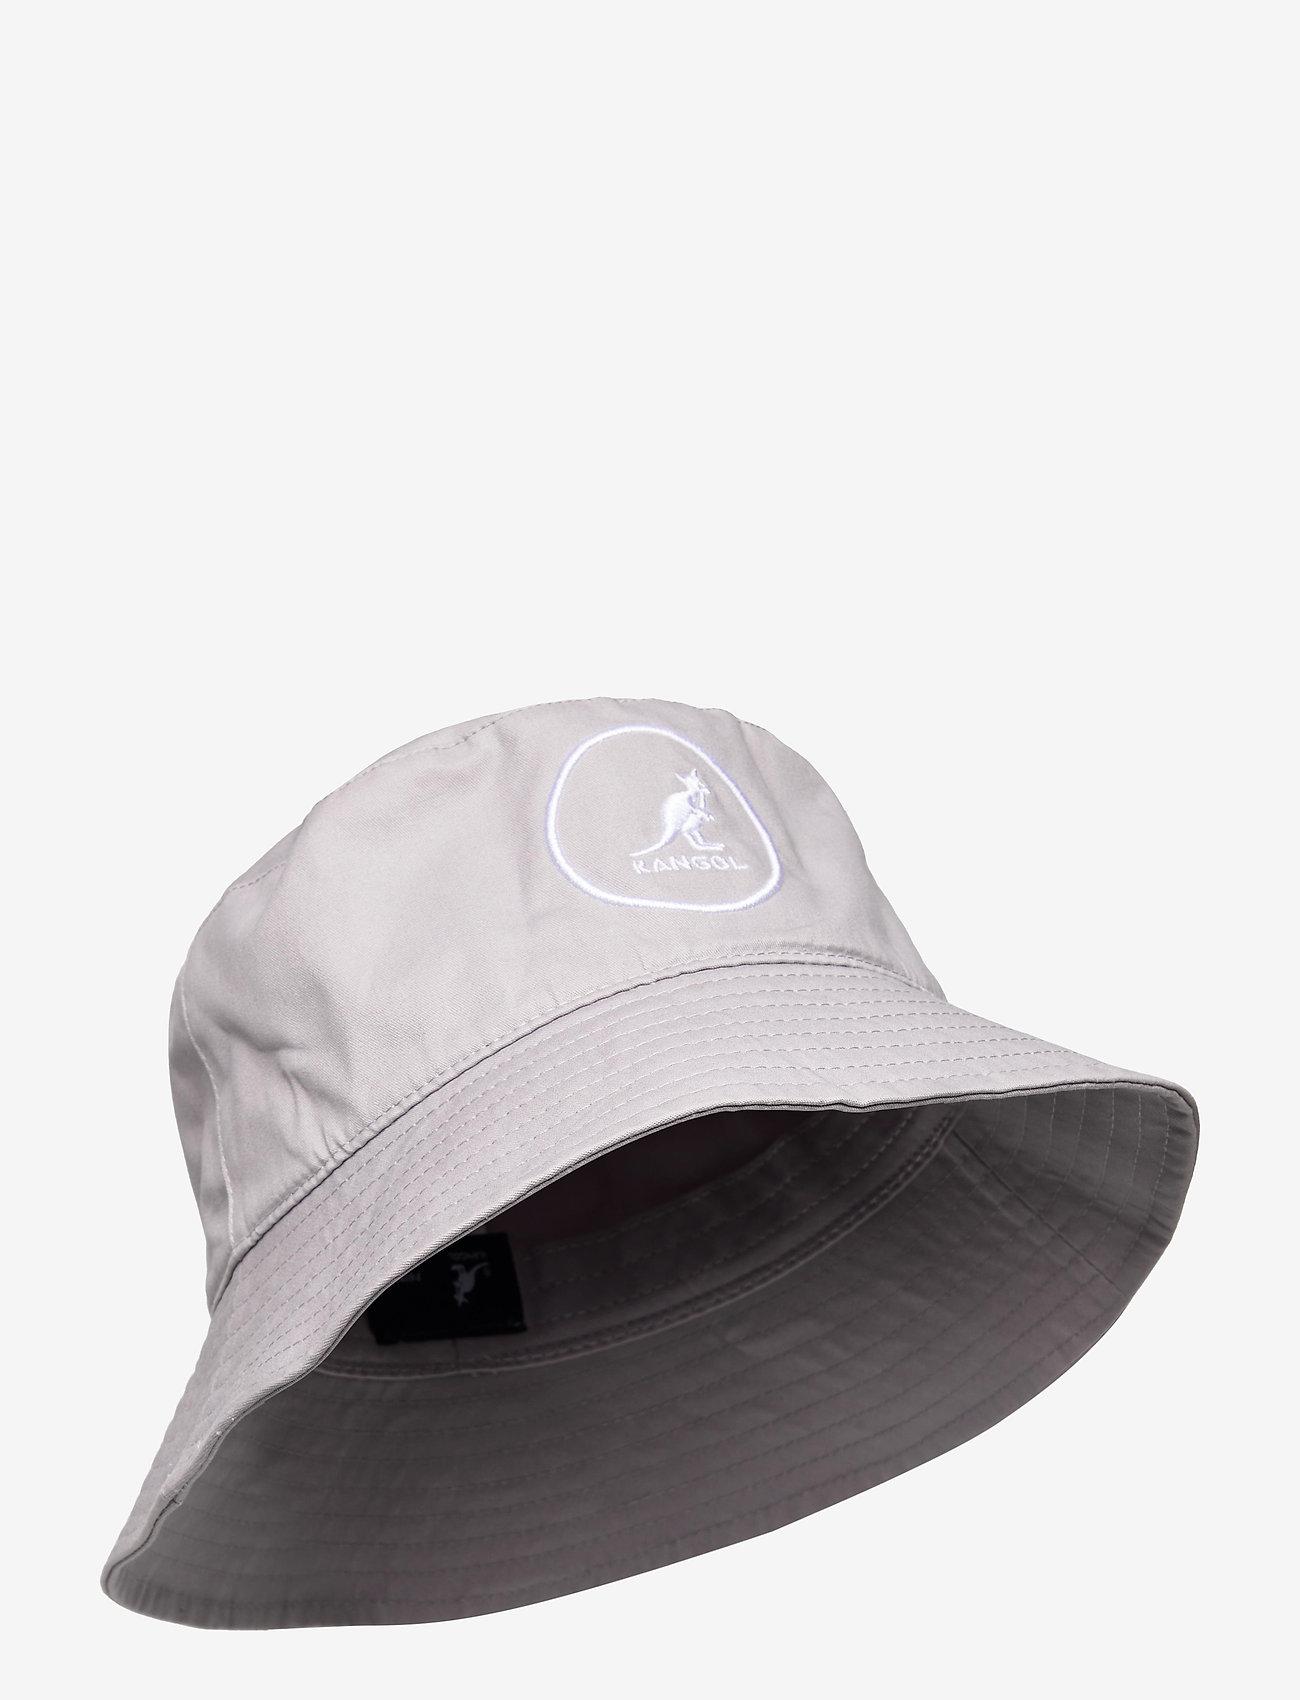 Kangol - KG COTTON BUCKET - bucket hats - light grey - 0